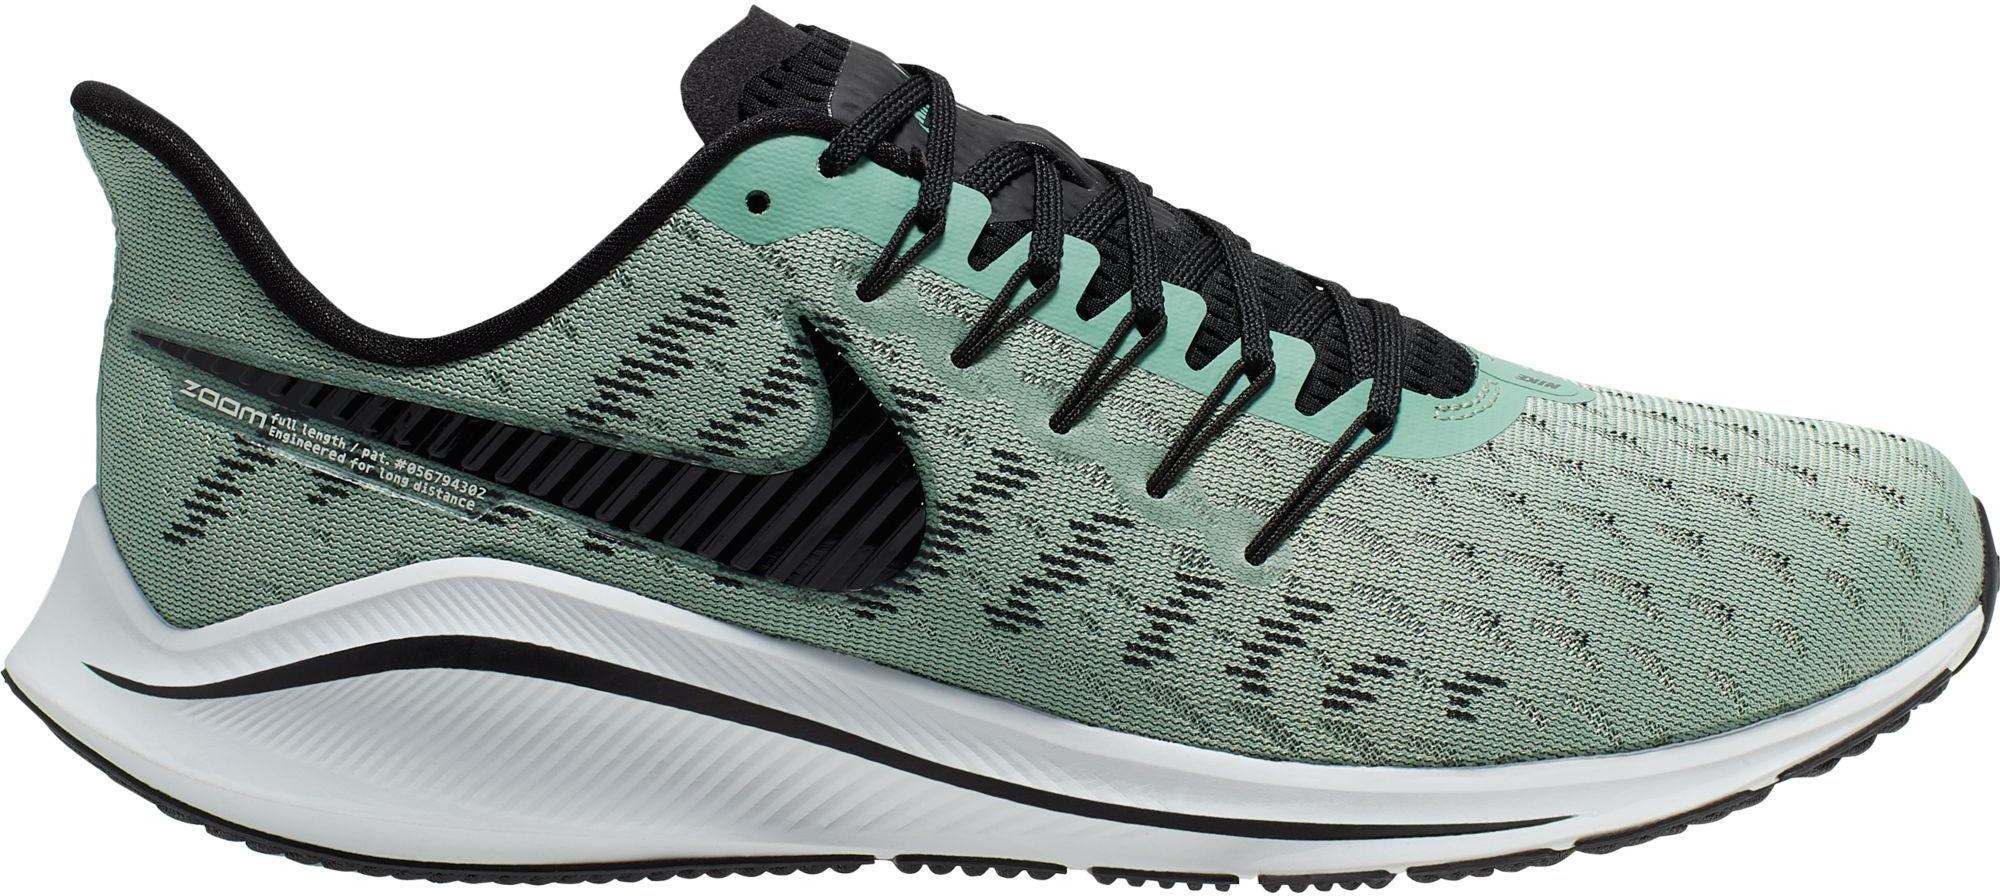 Paso calentar Figura  Running shoes Nike AIR ZOOM VOMERO 14 - Top4Football.com